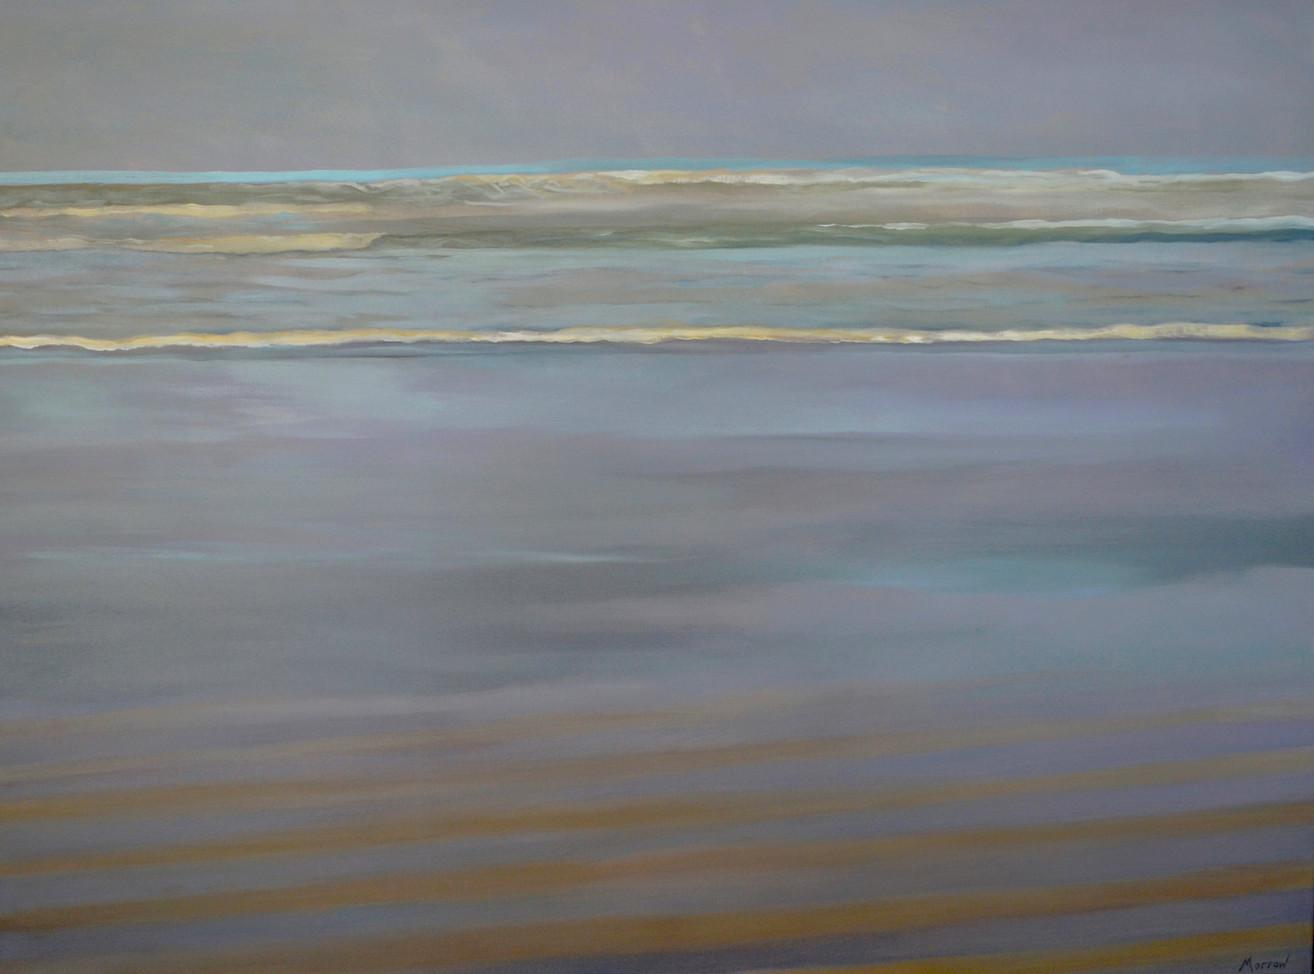 Beach with Turquoise Horizon